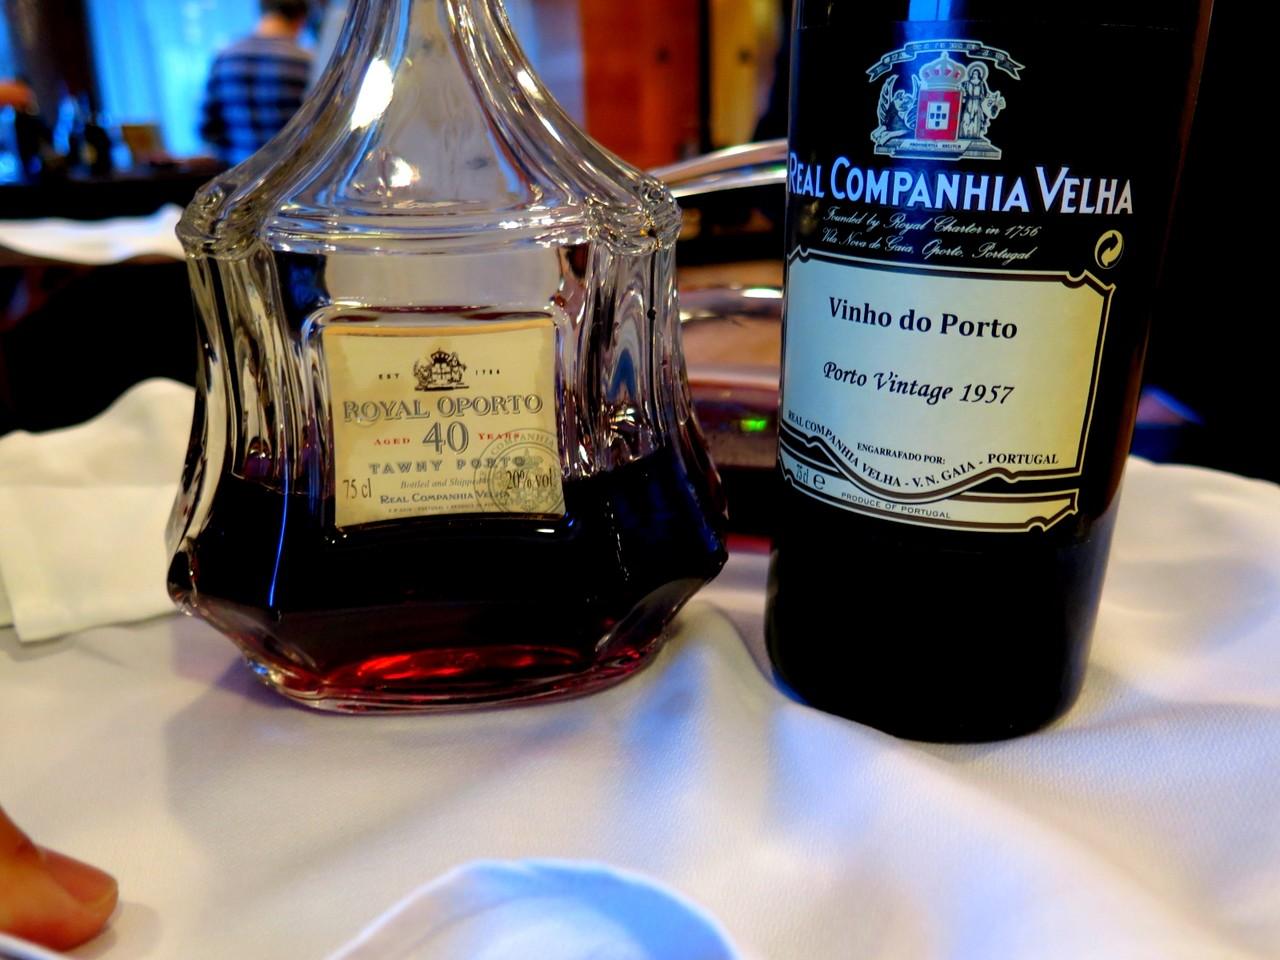 Royal Oporto Tawny 40 Anos e Real Companhia Velha Vintage 1957